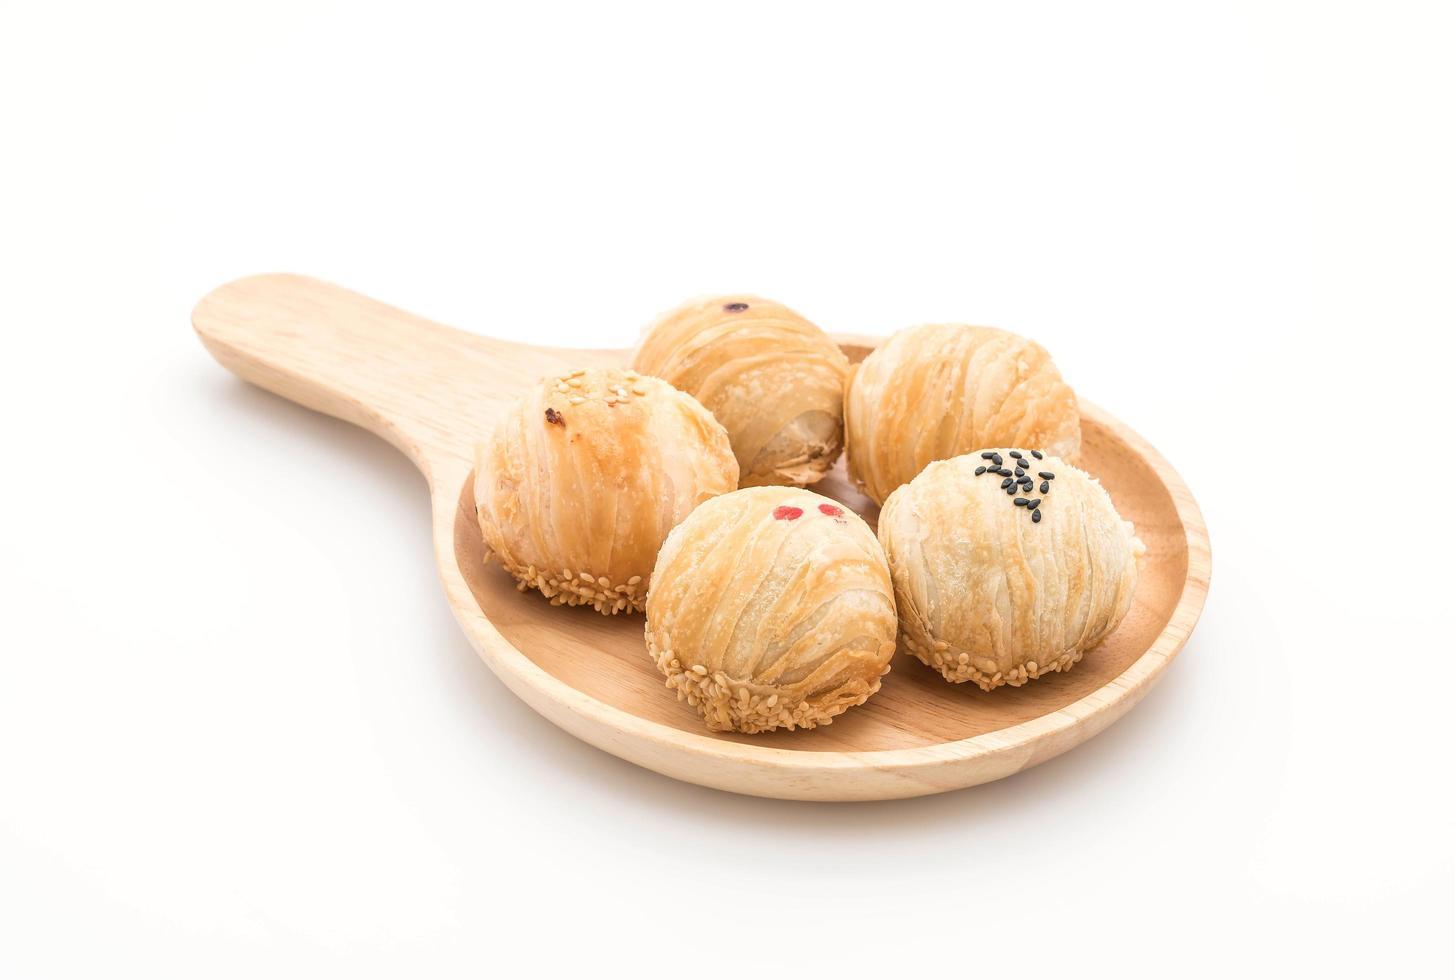 mung bean gebakjes op witte achtergrond foto